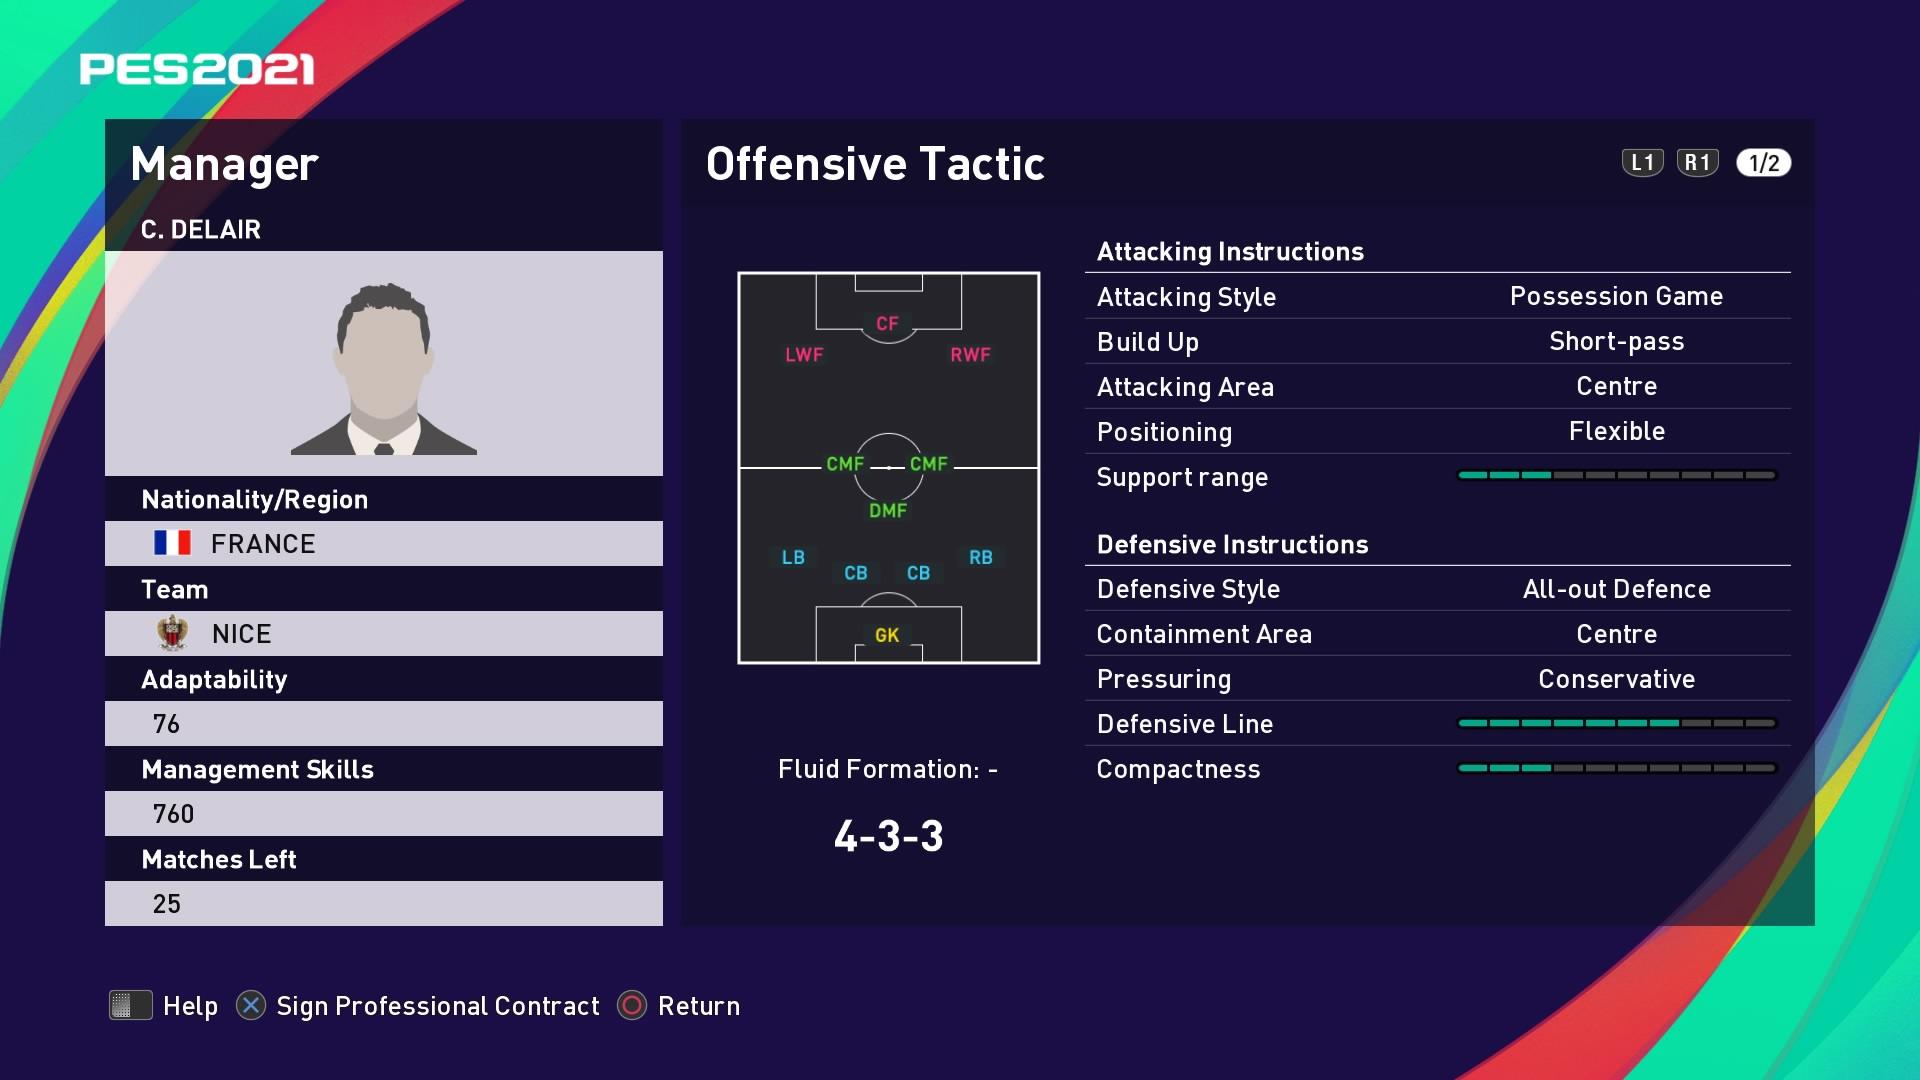 C. Delair (Patrick Vieira) Offensive Tactic in PES 2021 myClub